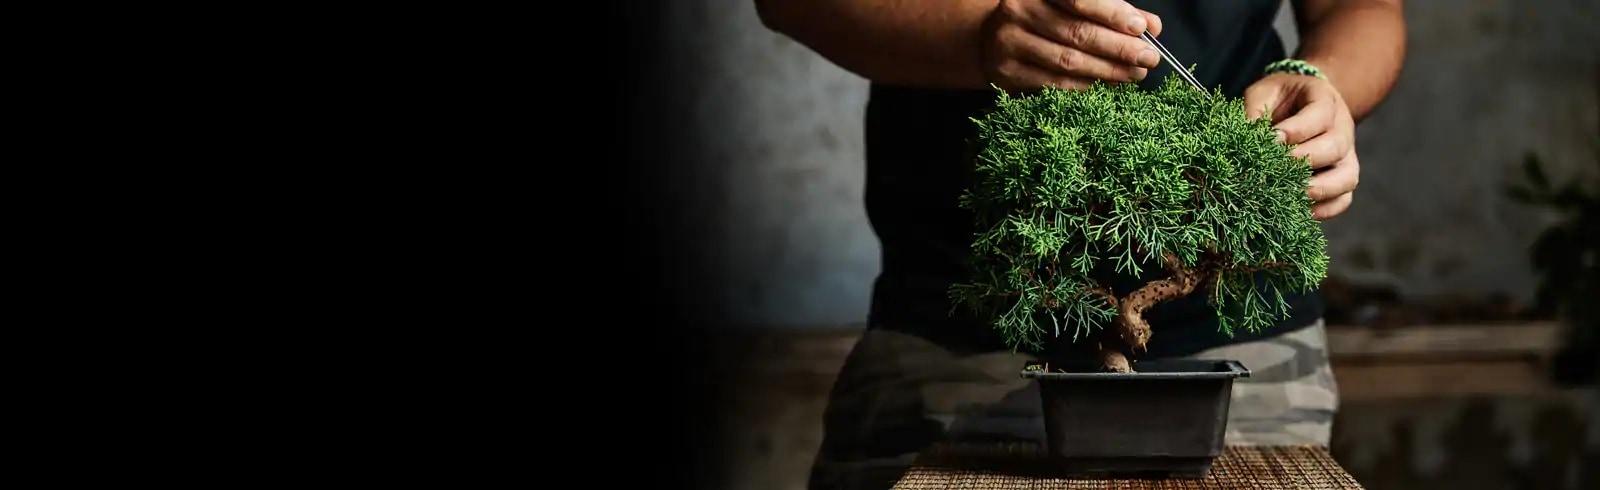 Plant, Person, Human